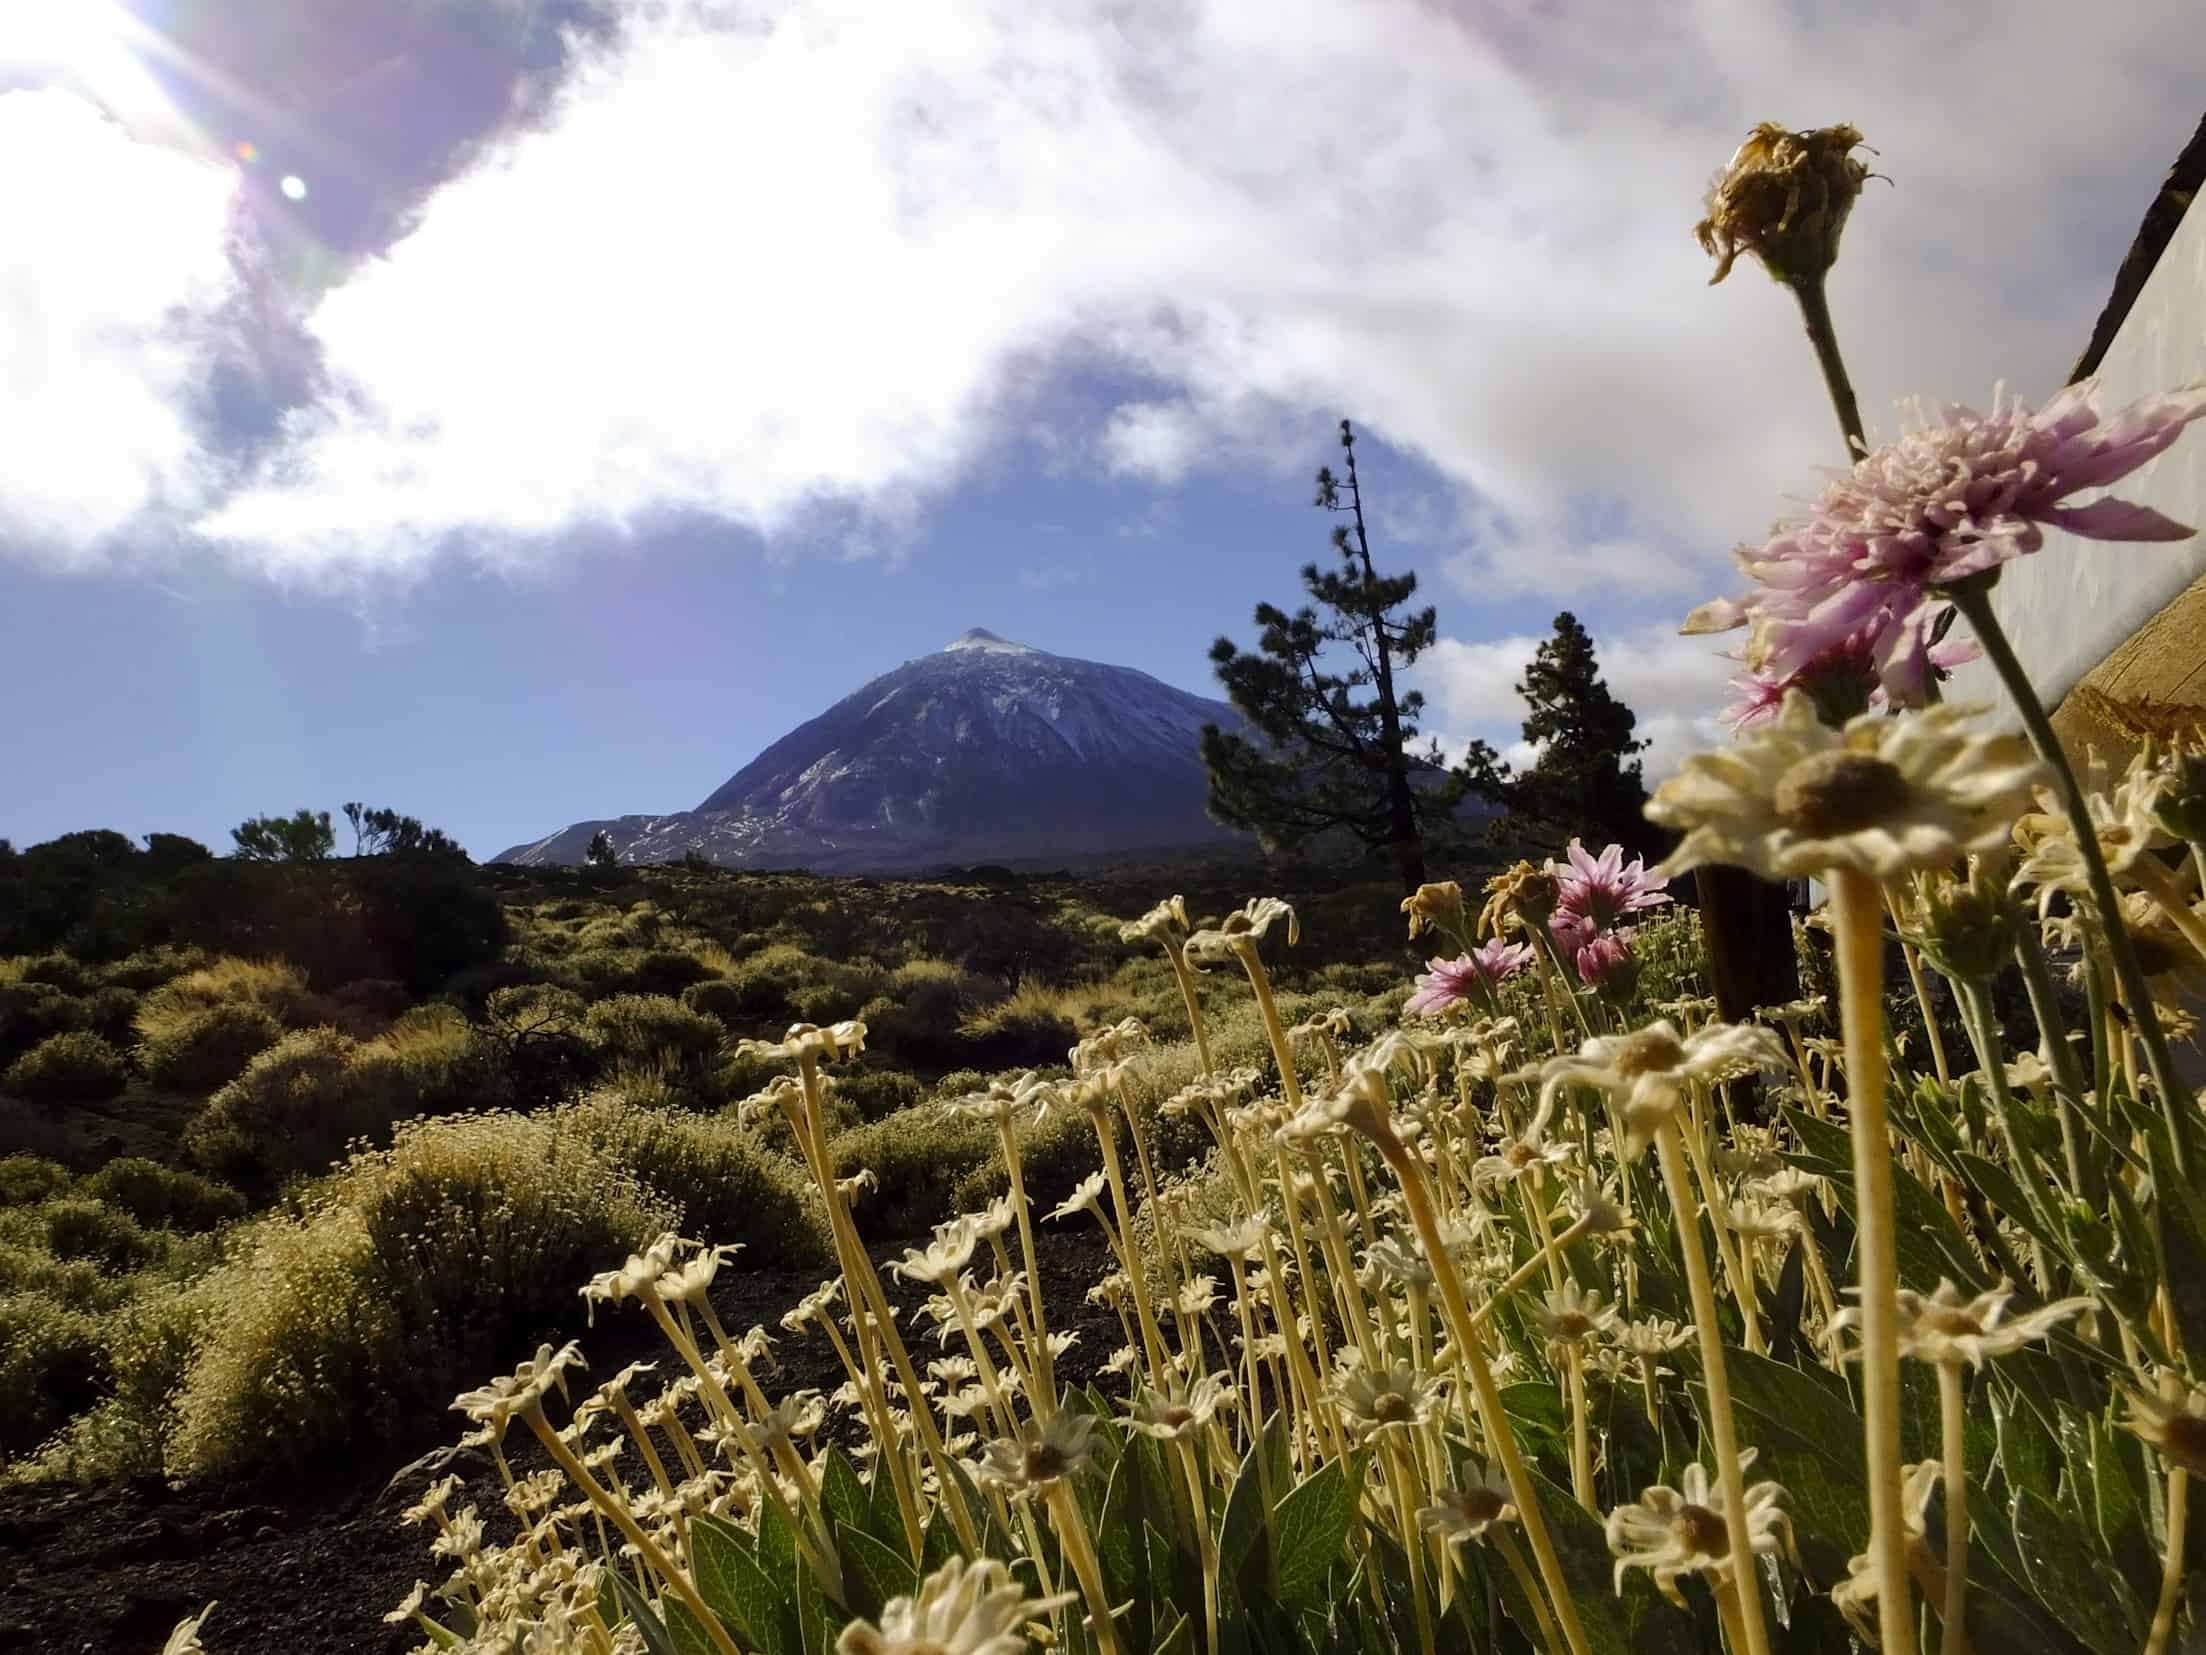 De witte top van Pico del Teide